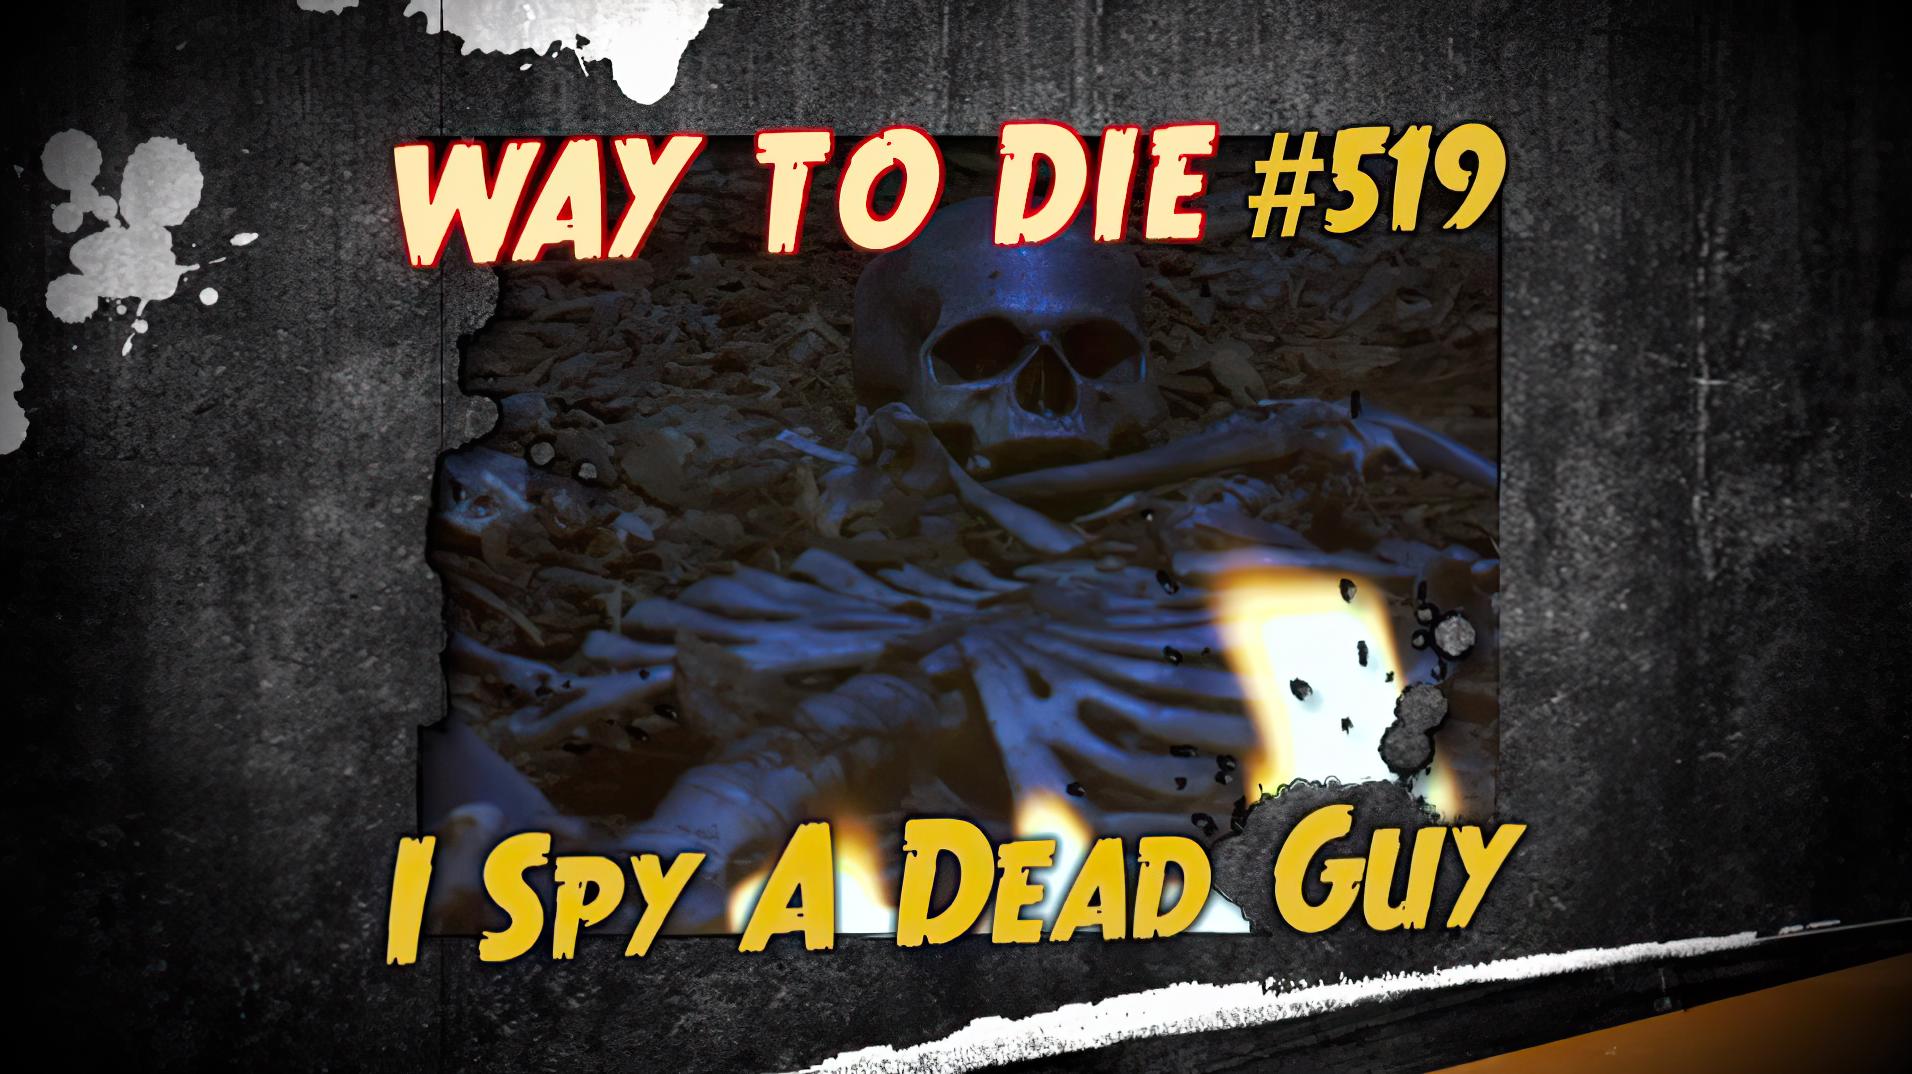 I Spy A Dead Guy